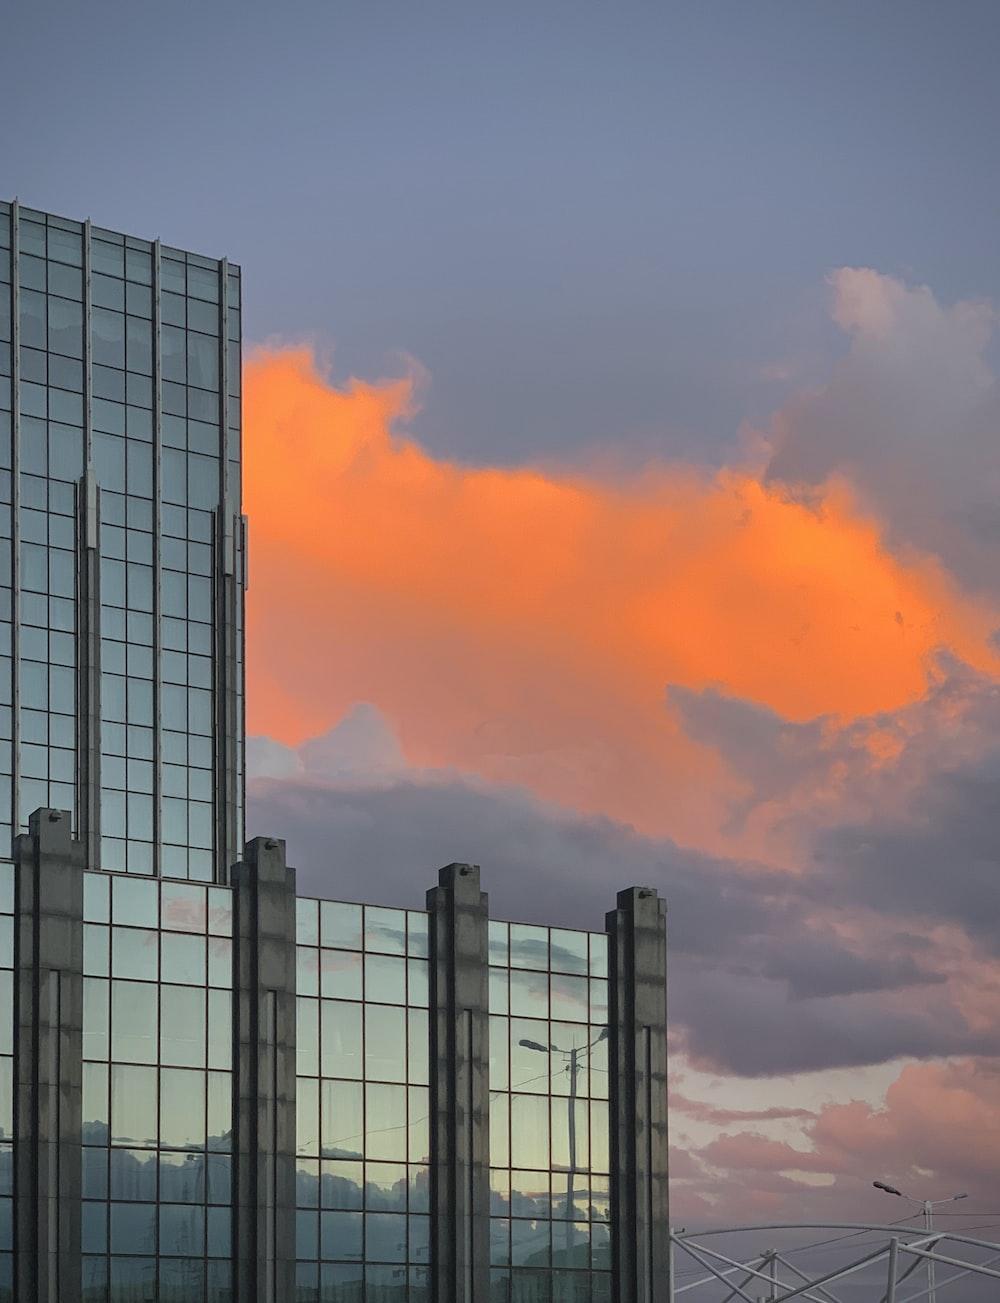 gray concrete building under orange clouds